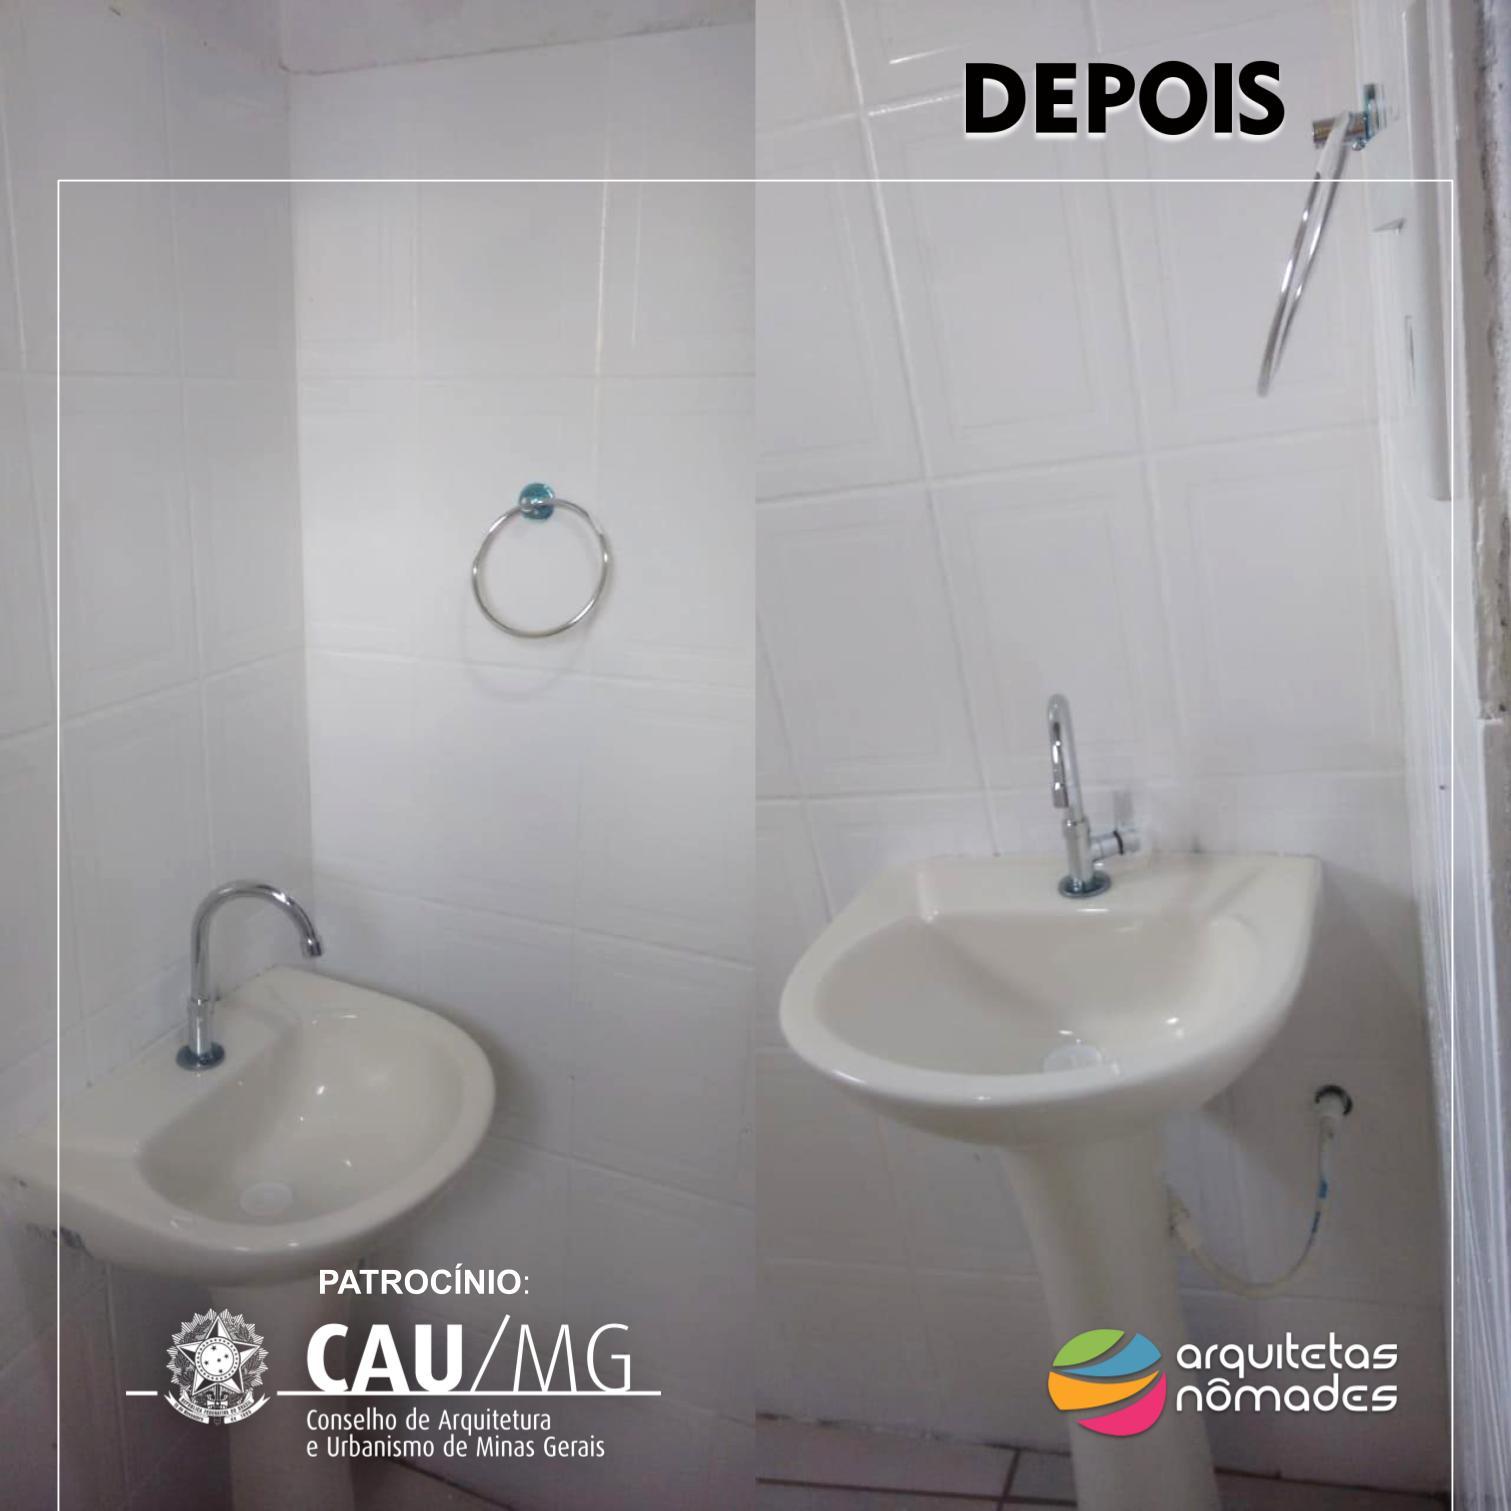 DEPOIS3